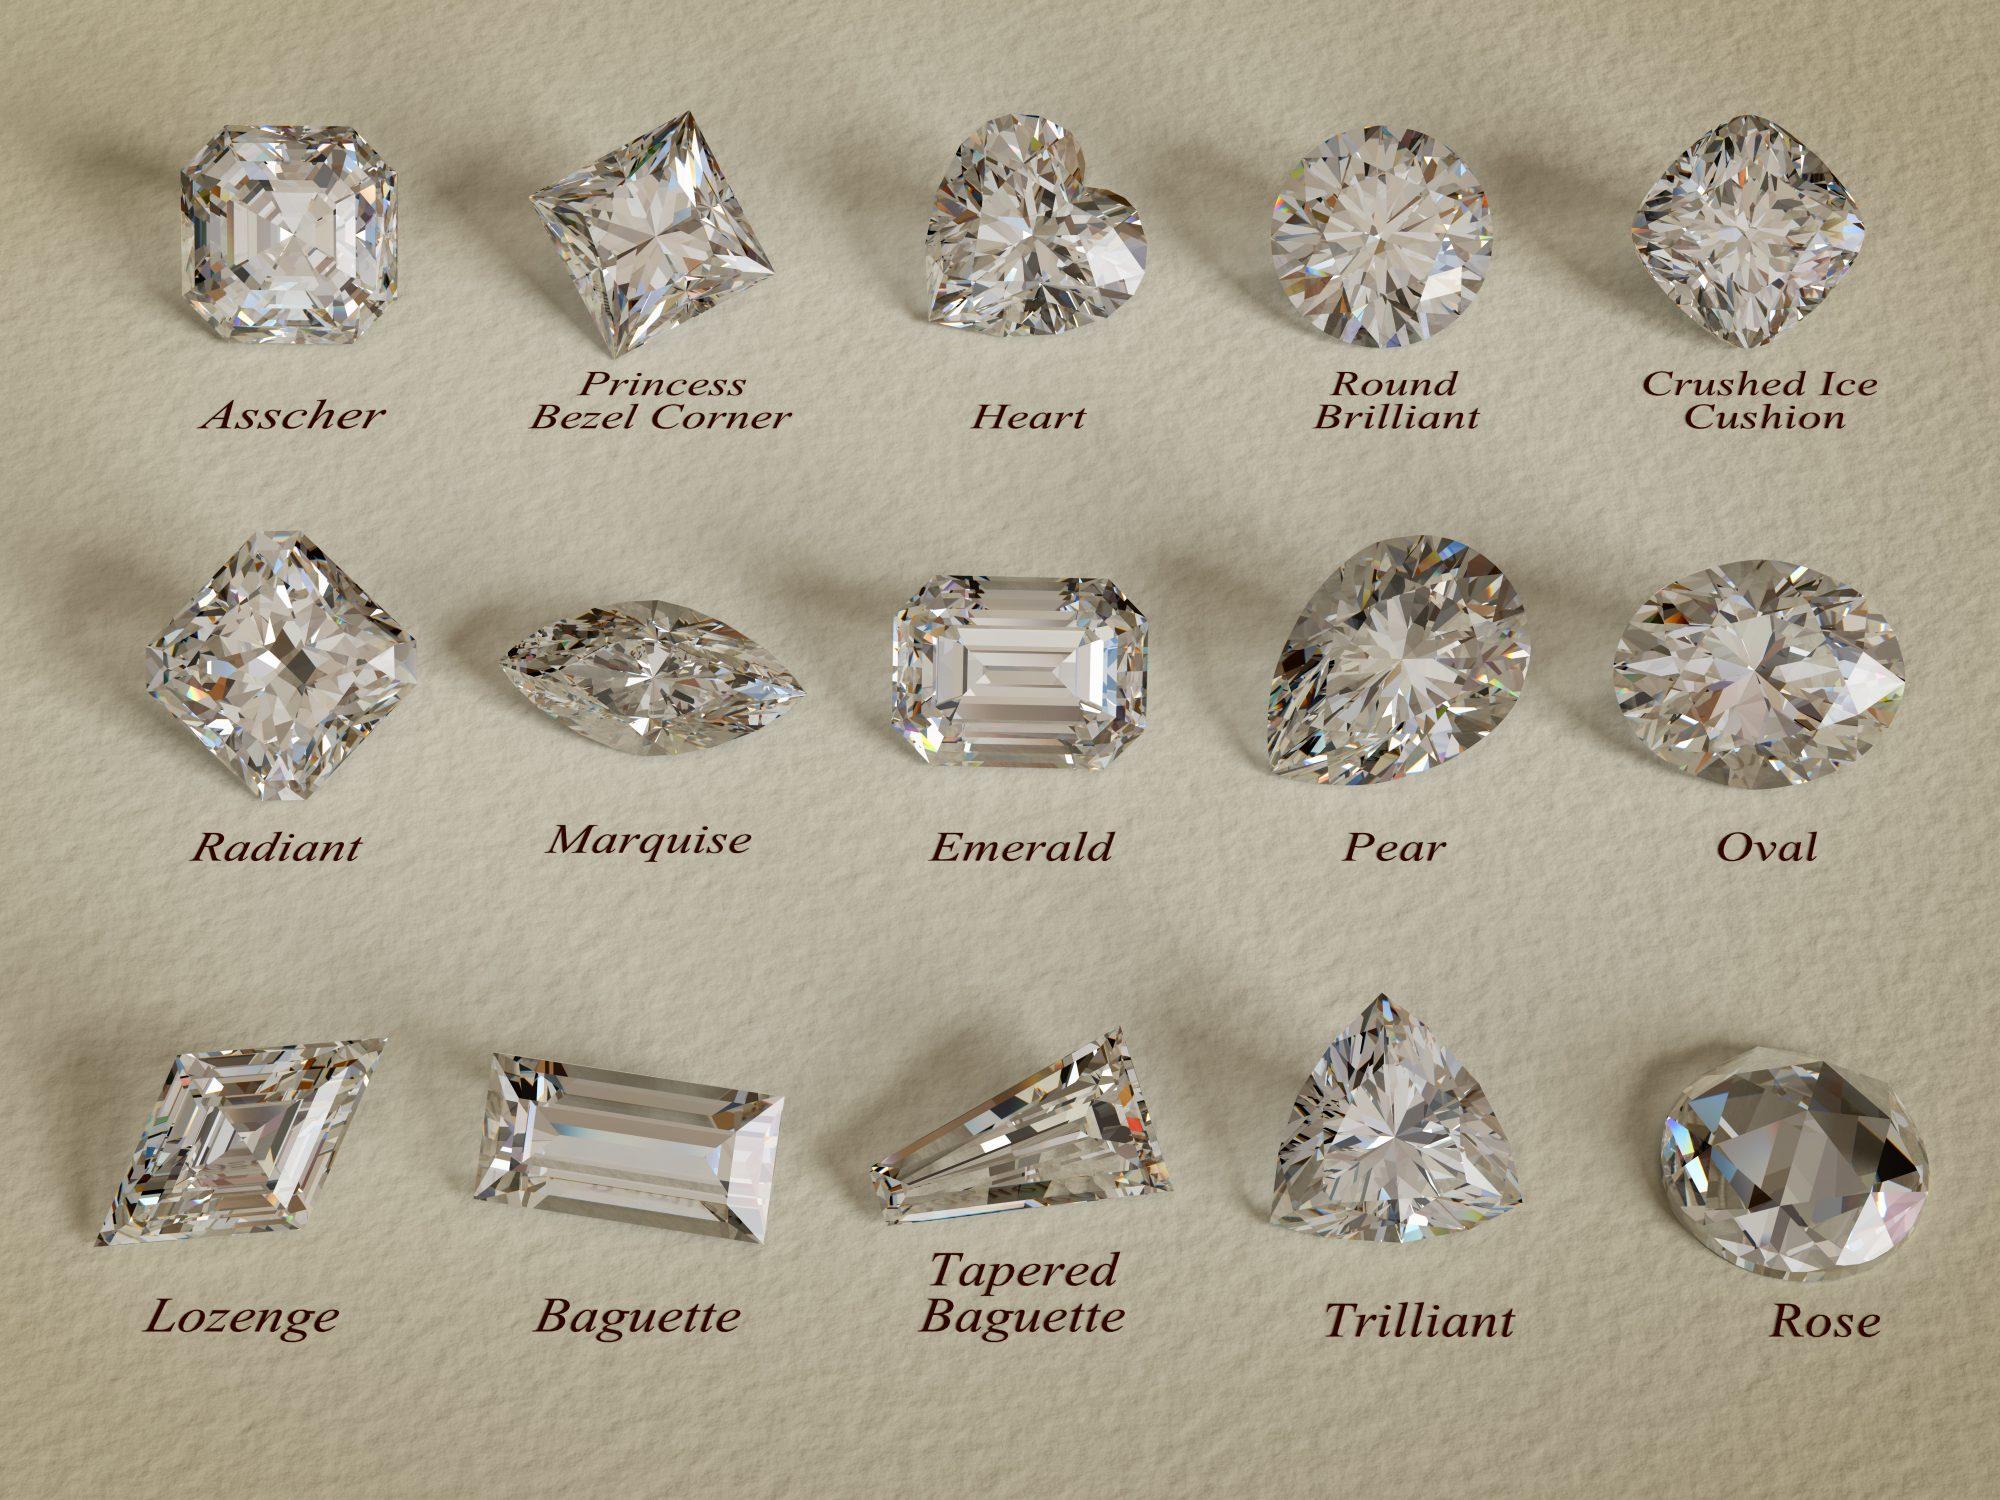 Loose Diamonds cuts